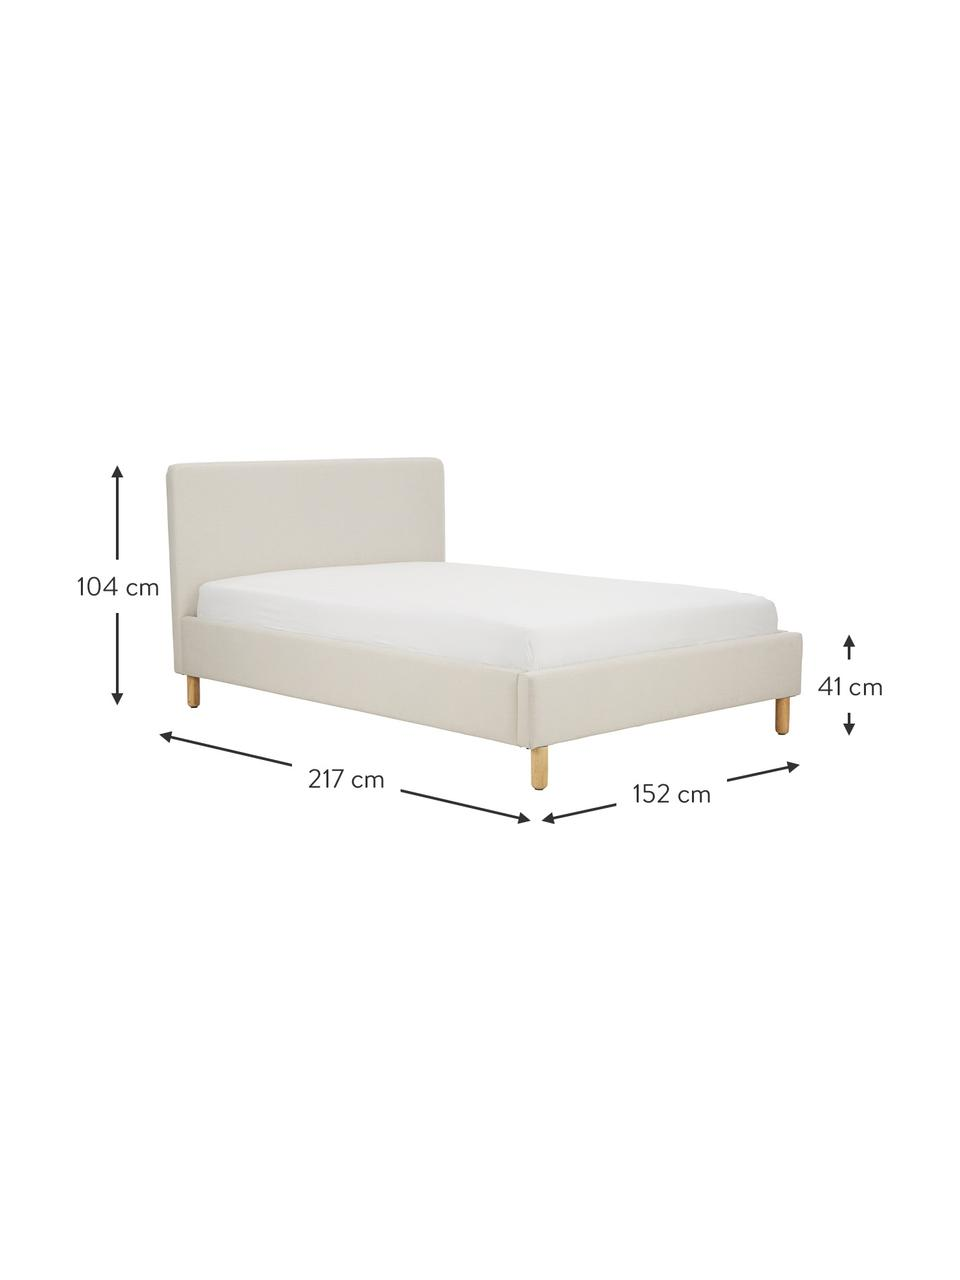 Gestoffeerd bed Celeste in crèmewit, Frame: massief grenenhout, multi, Bekleding: polyester (gestructureerd, Poten: massief gelakt rubberhout, Stof crèmewit, 180 x 200 cm